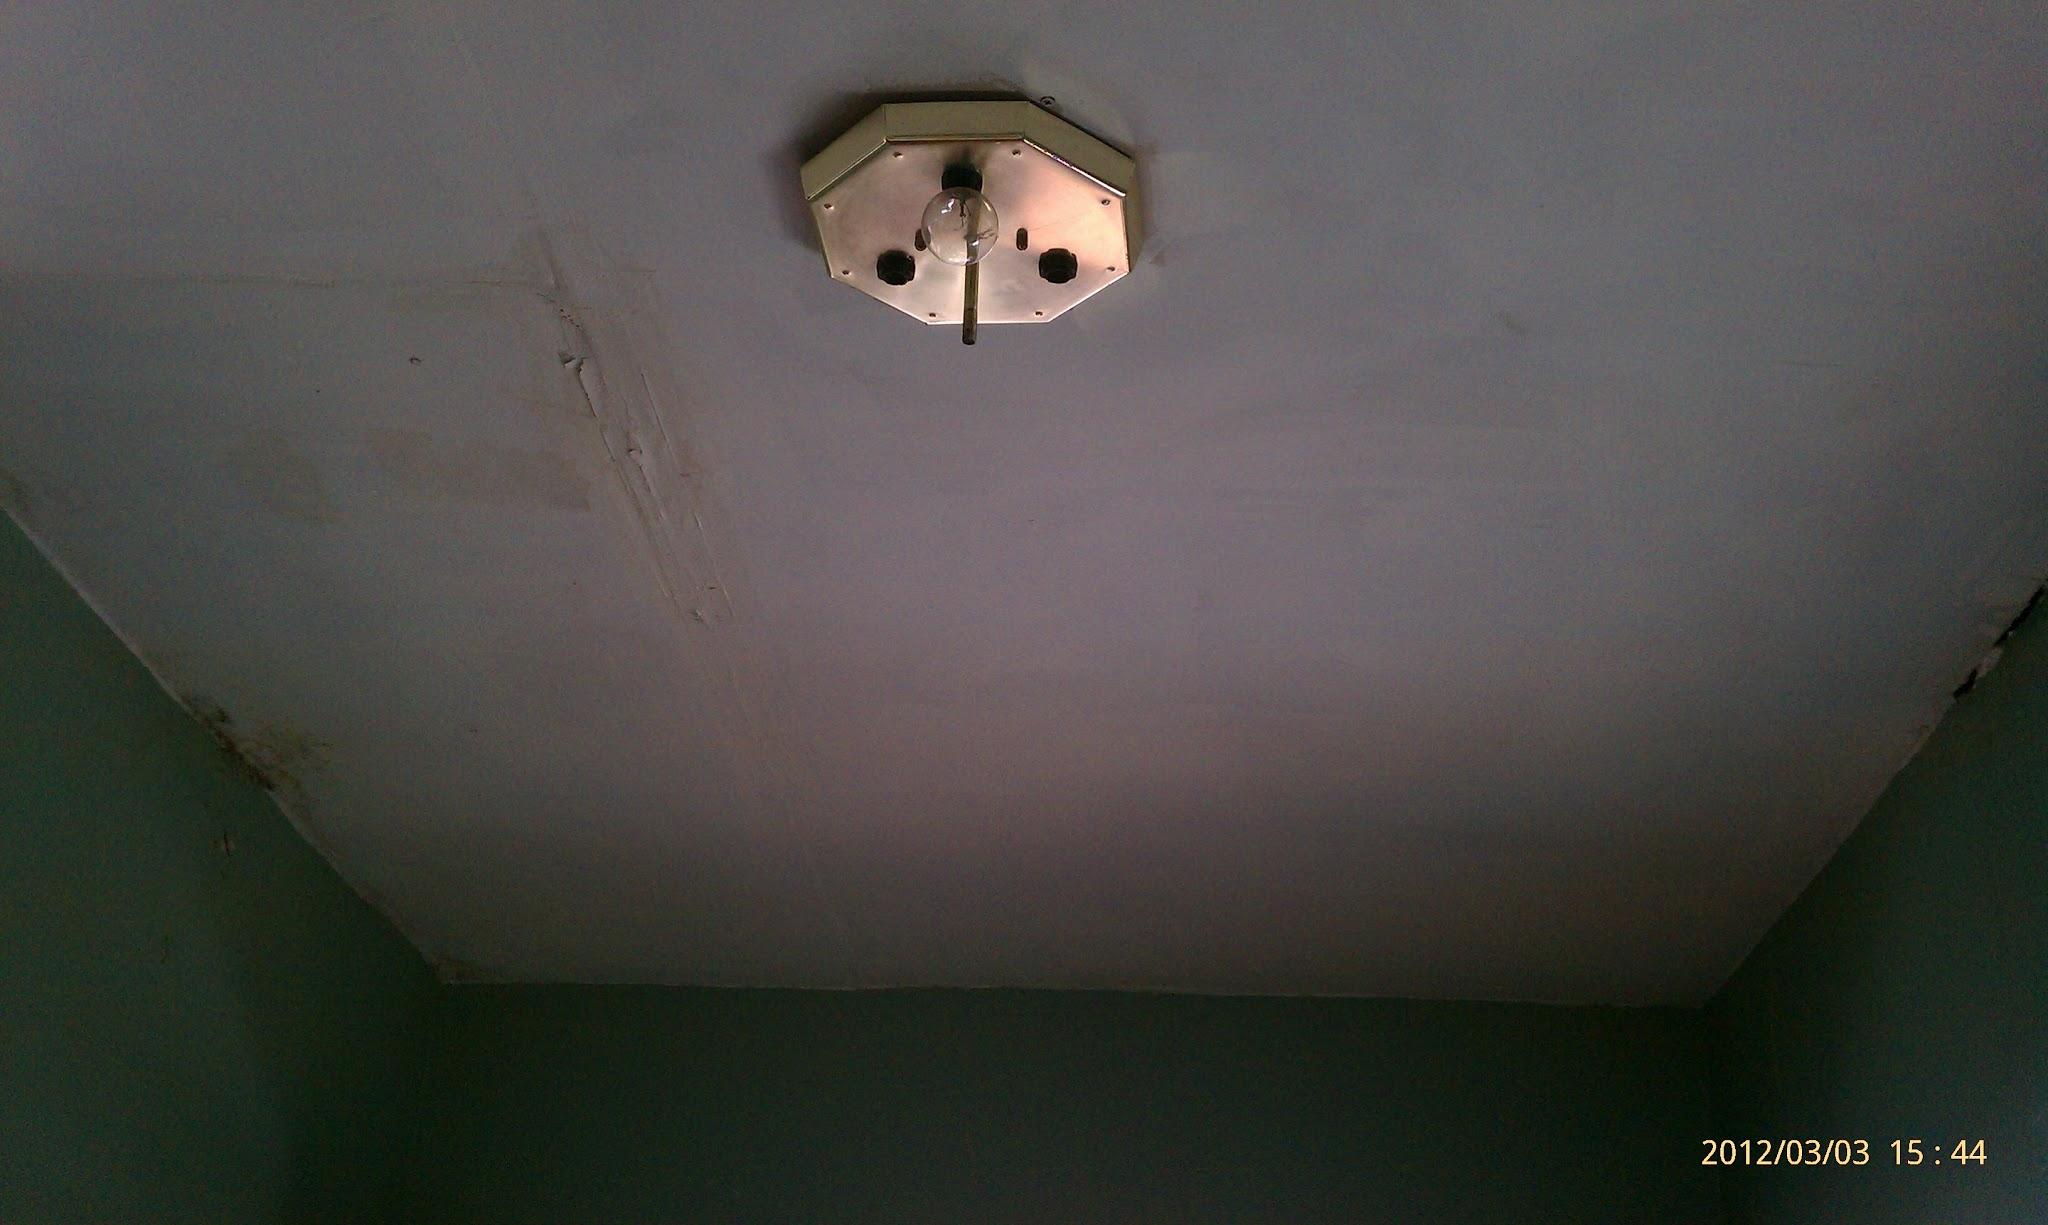 Replace lighting fixture on first floor